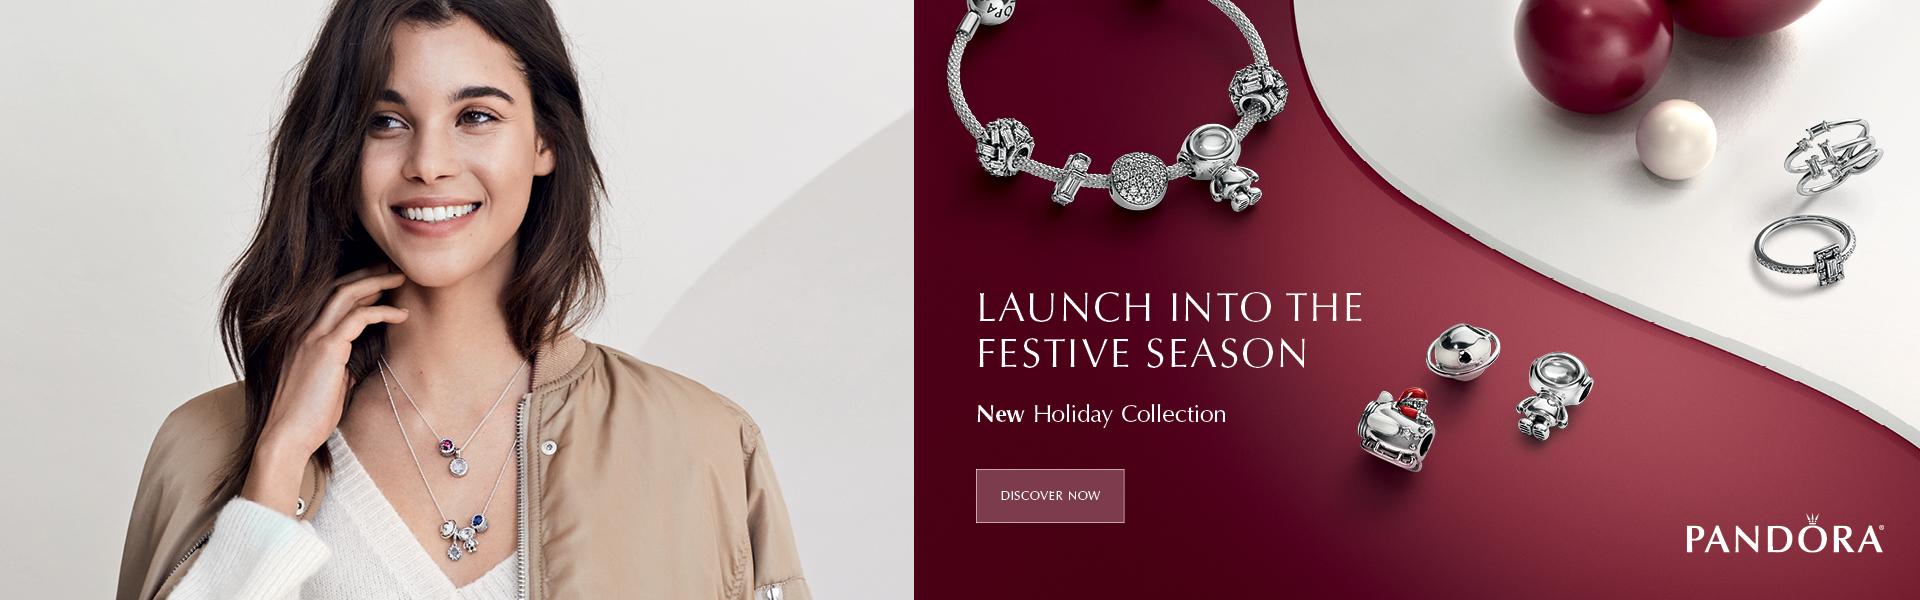 Launch Into The Festive Season